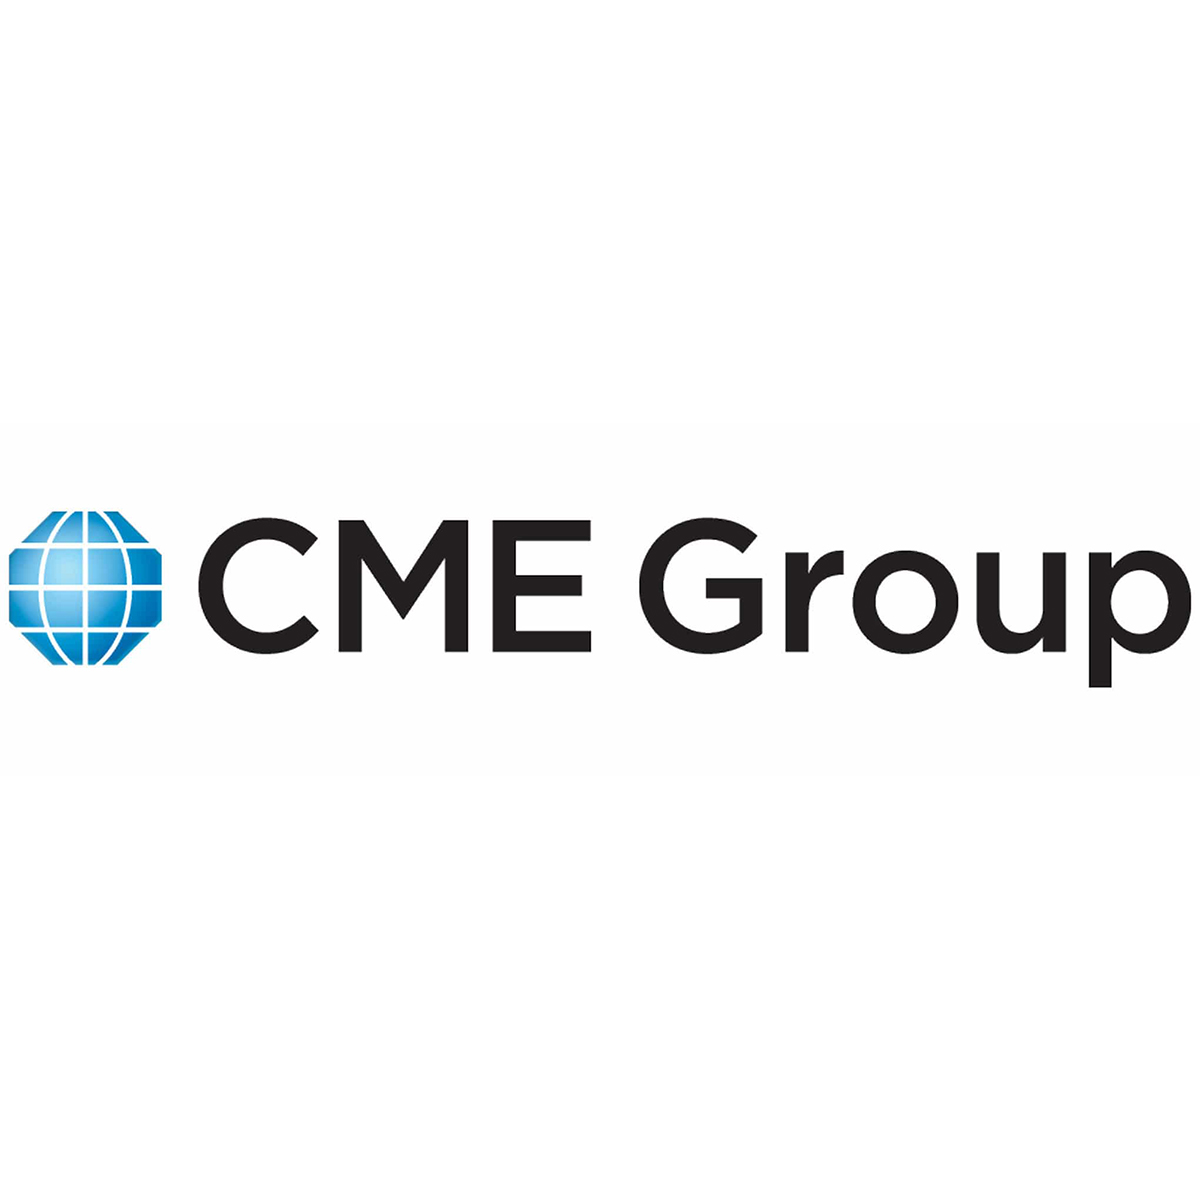 B-CME Group.jpg